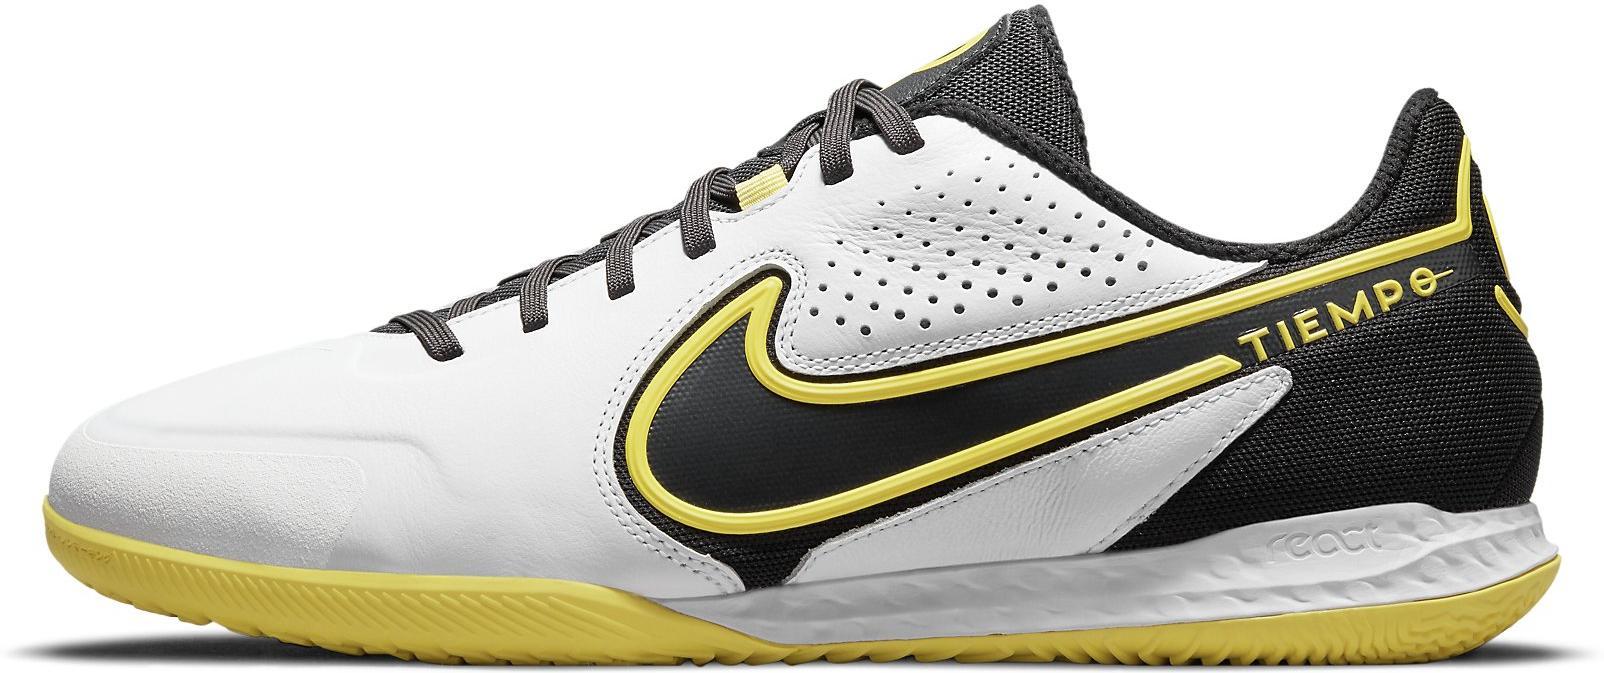 Indoor/court shoes Nike React Tiempo Legend 9 Pro IC